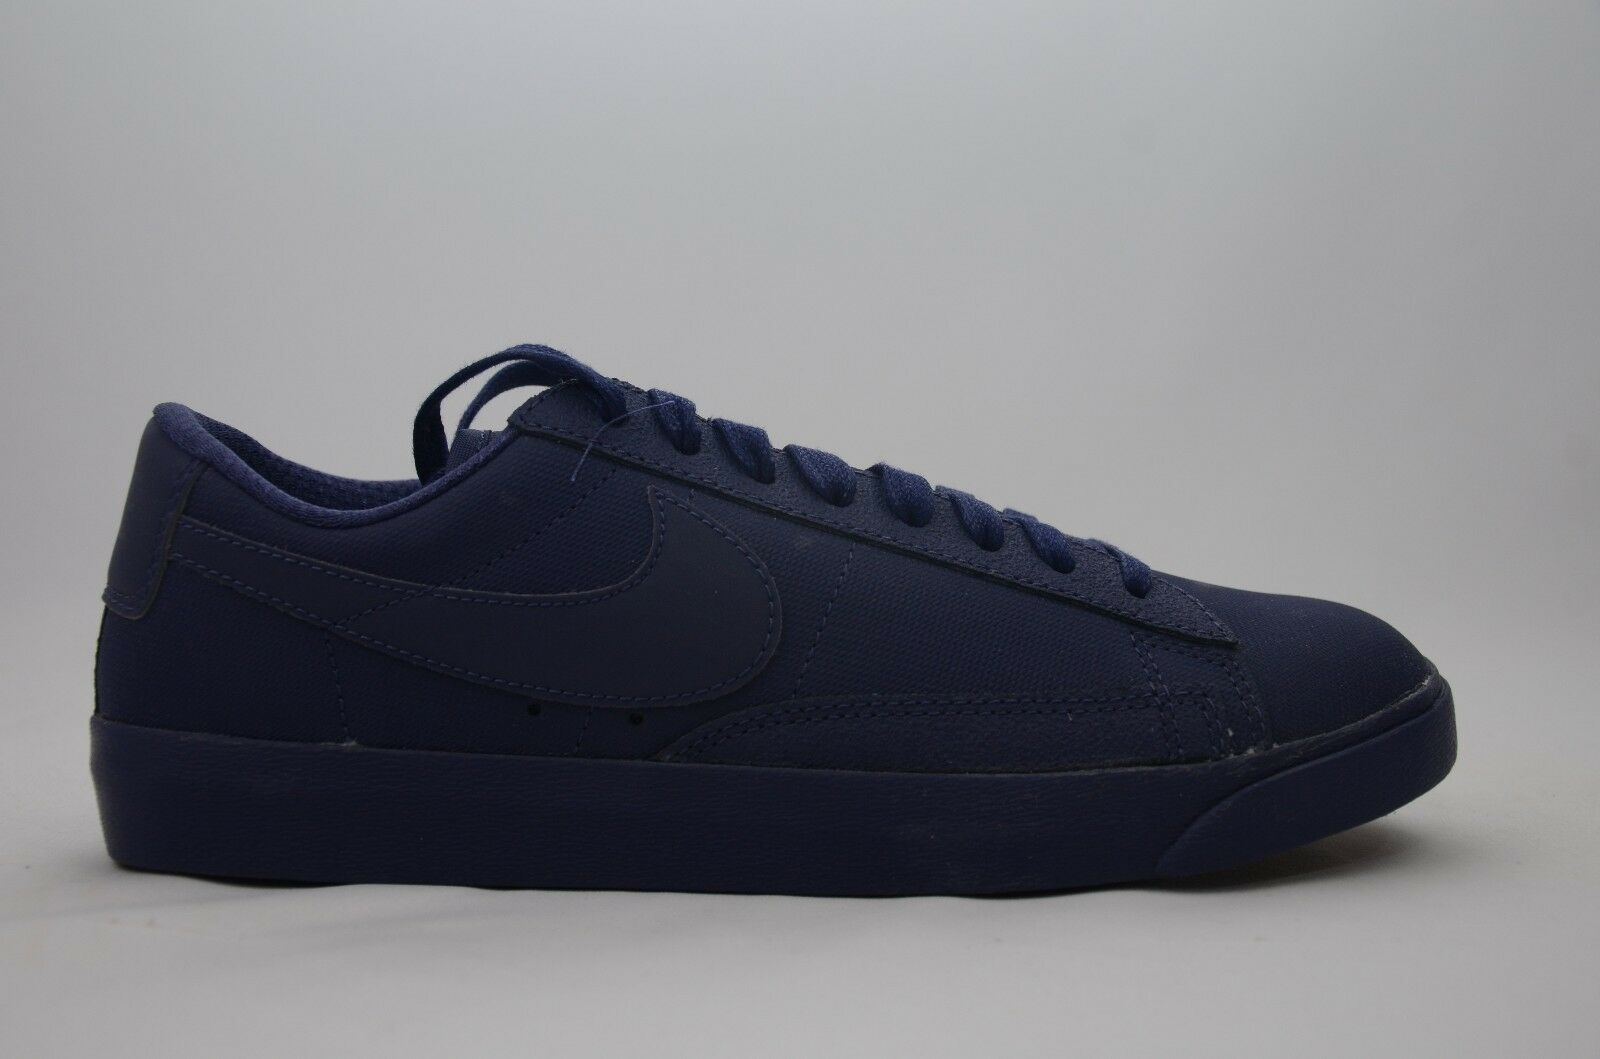 Nike blazer basso pinnacle indigo le 8 nuove in scatola aa3967 500